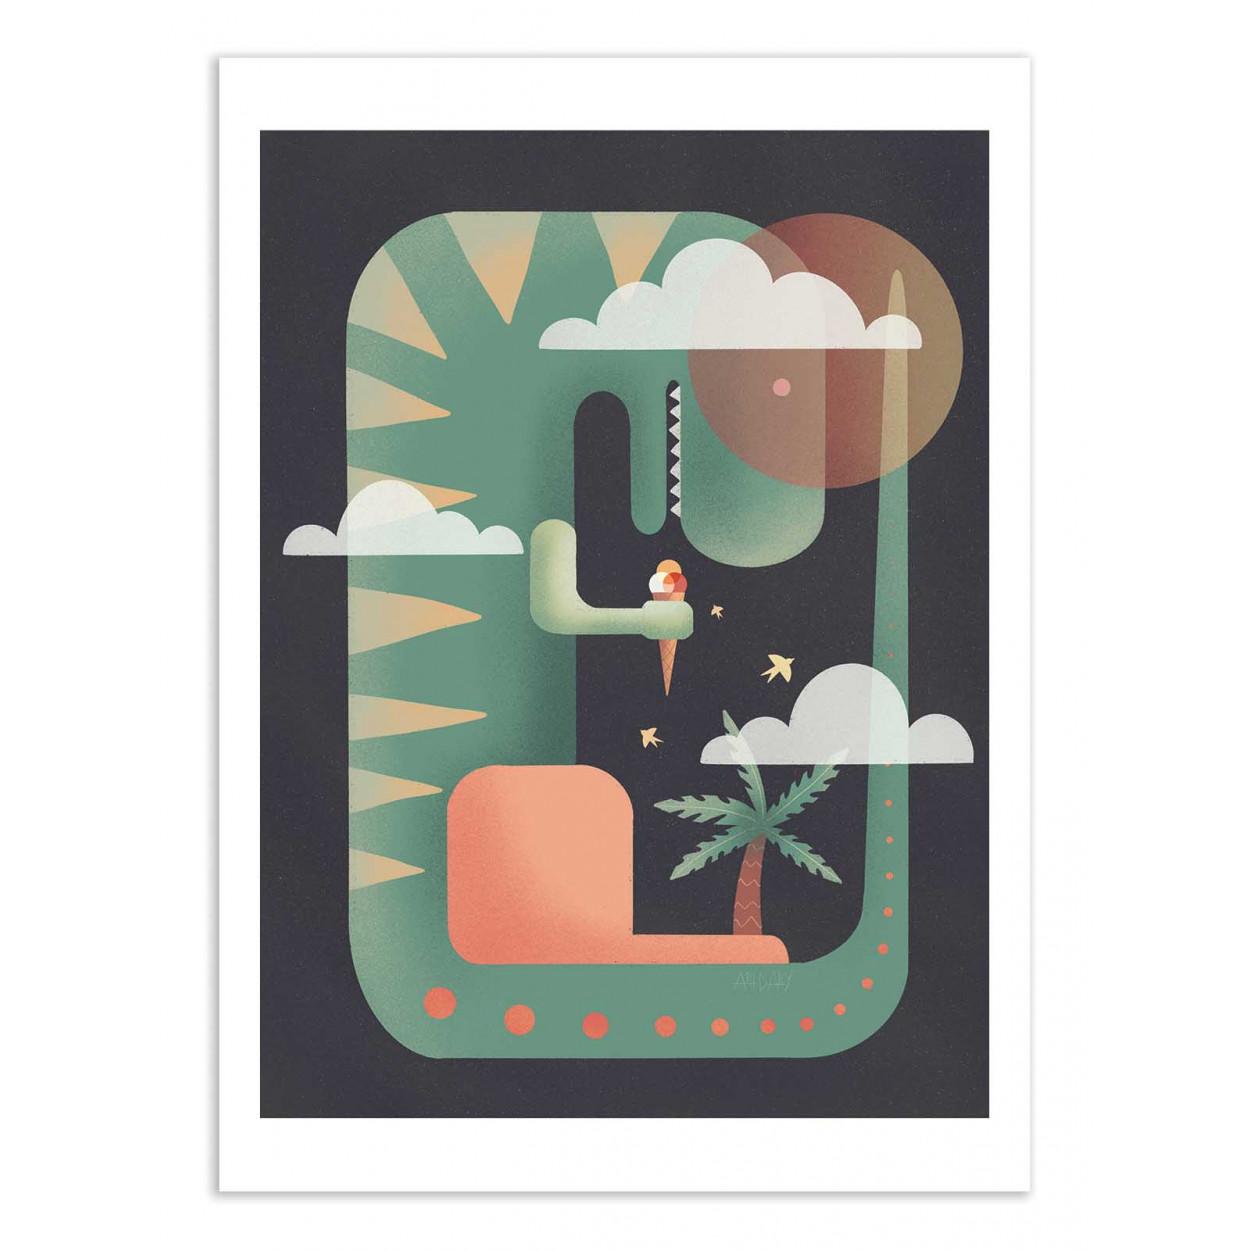 T-REXY - DARY MALTSEVA -  Affiche d'art 50 x 70 cm